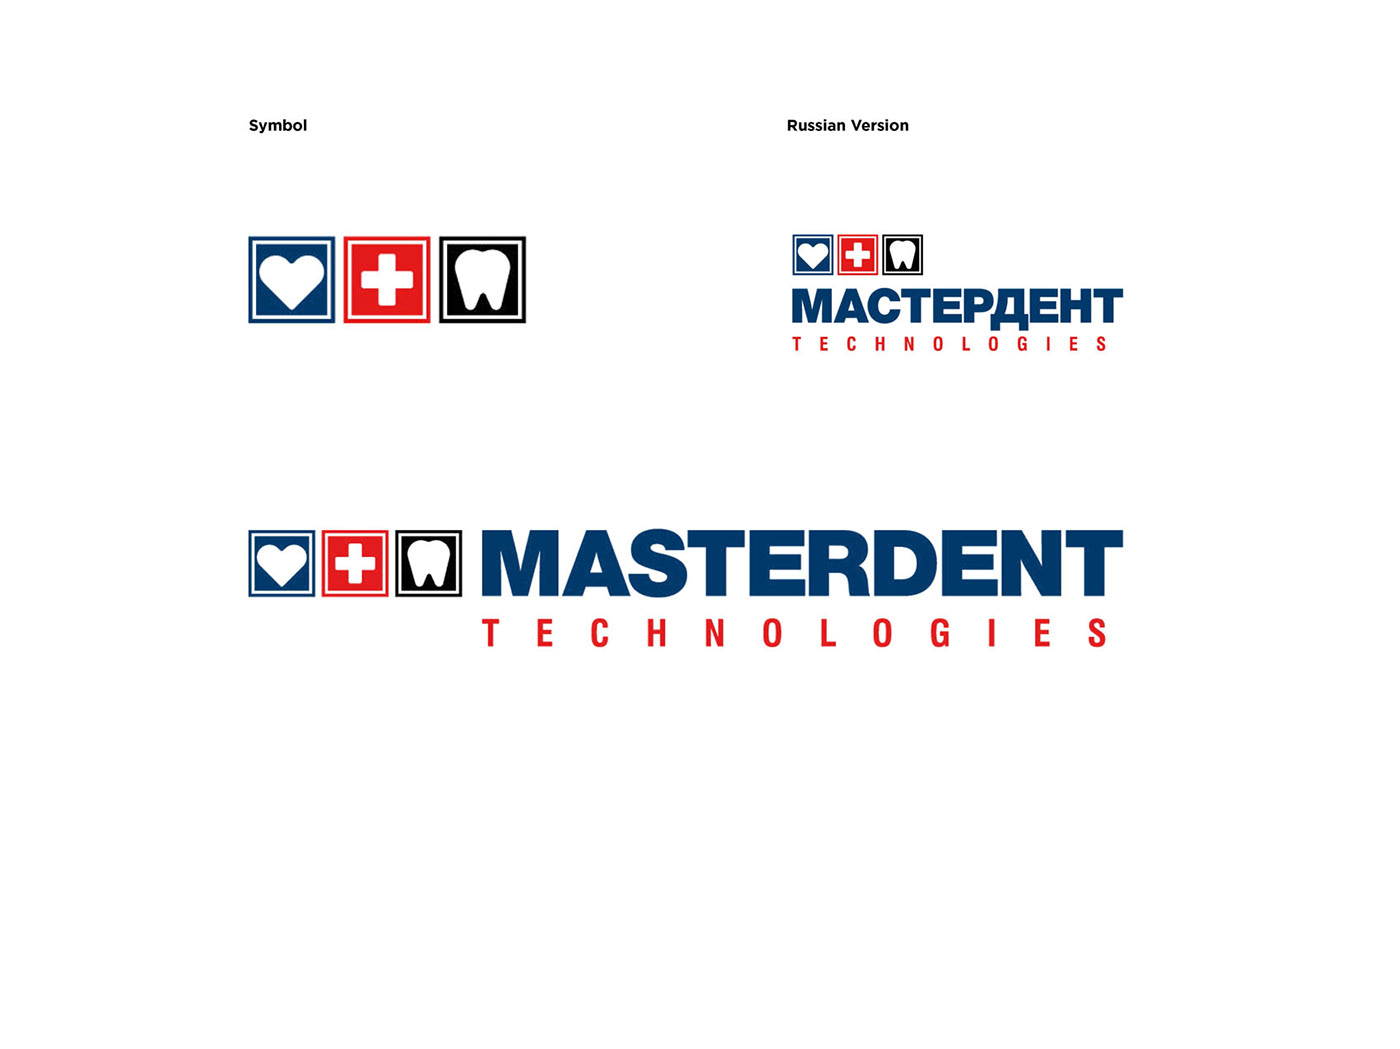 МастерДент визуальная айдентика / MasterDent Identity